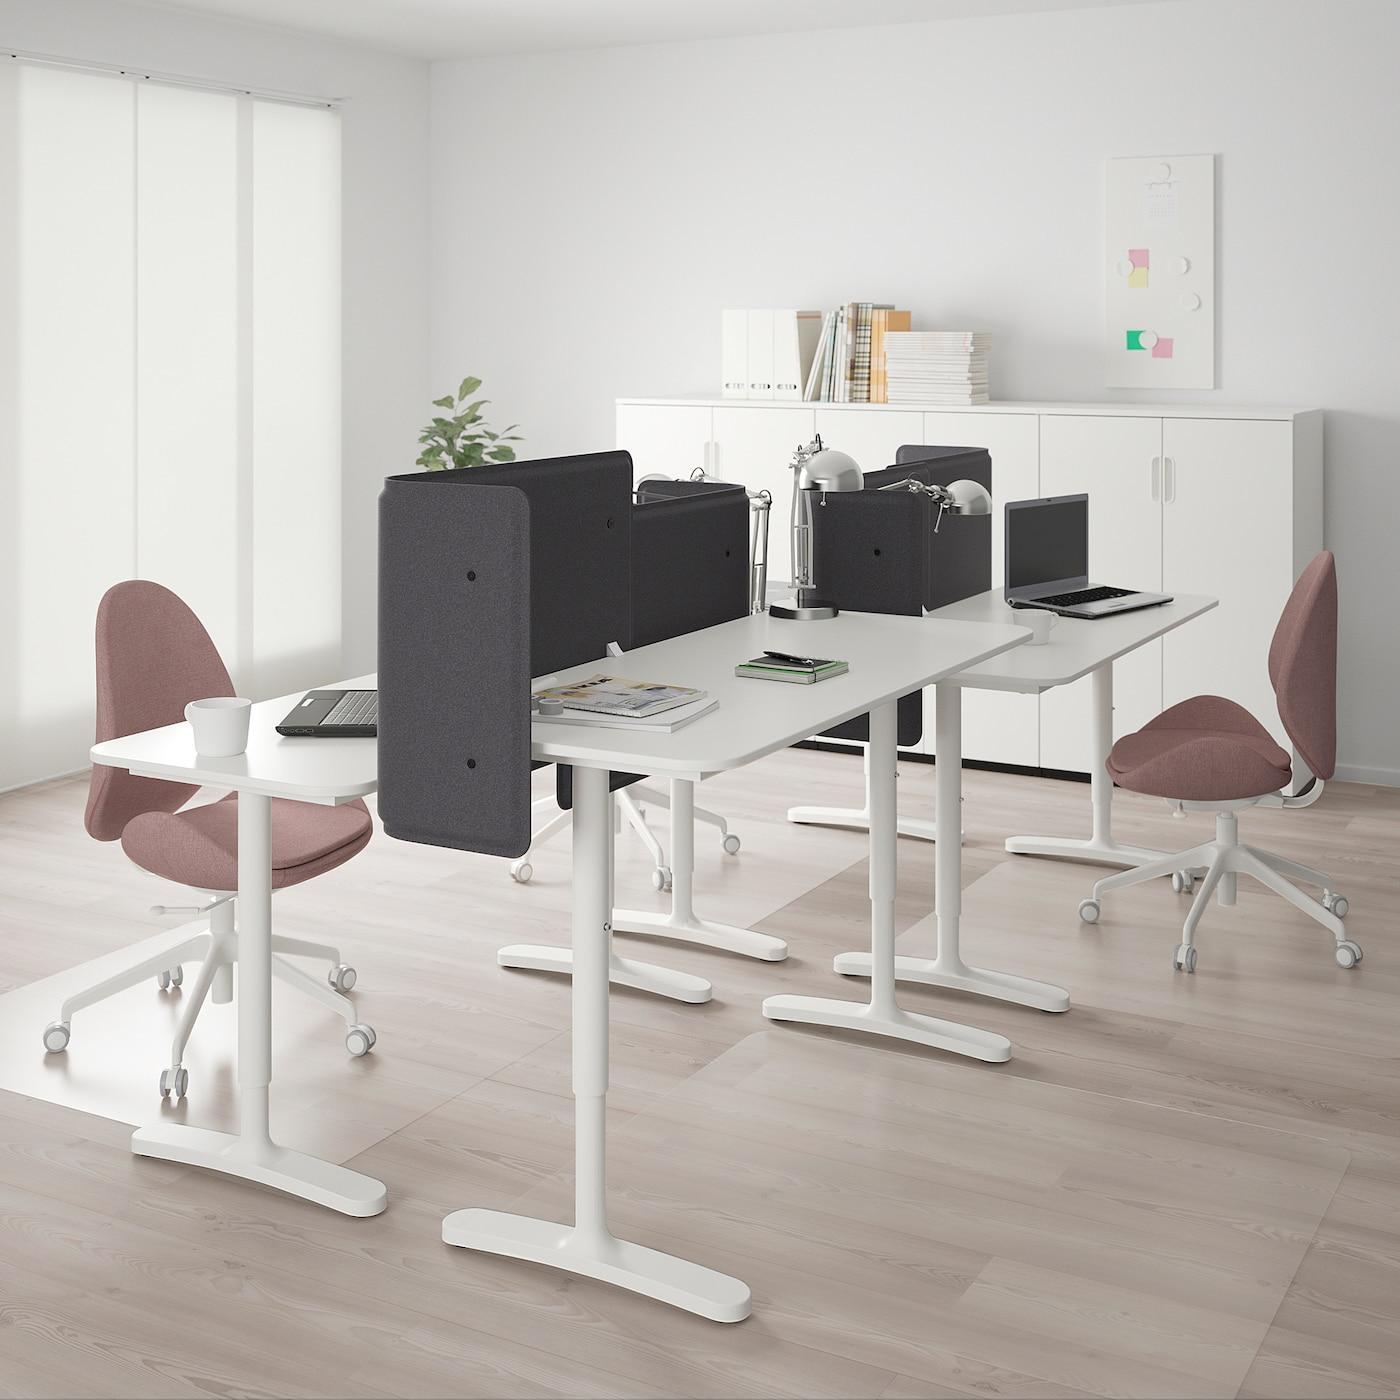 BEKANT 贝肯特 书桌组合, 白色, 280x120 厘米